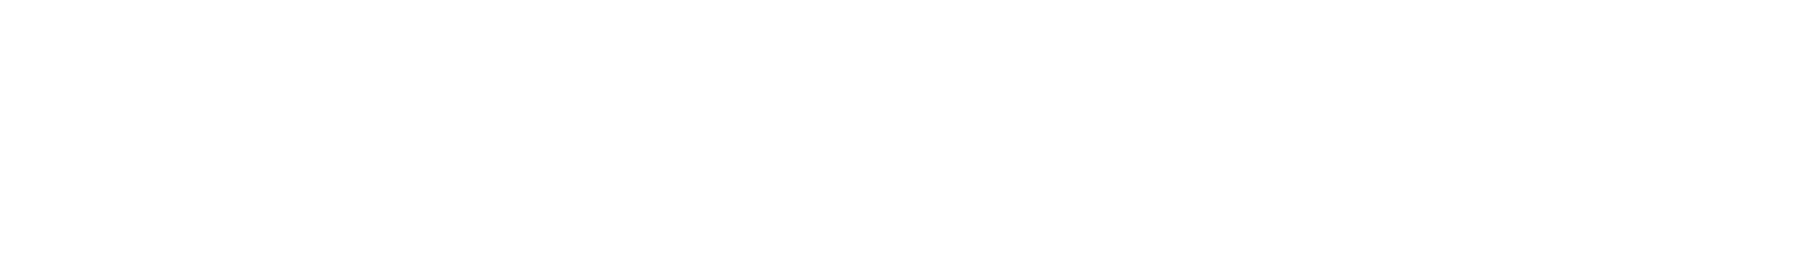 untitled song 11 online audio converter.com